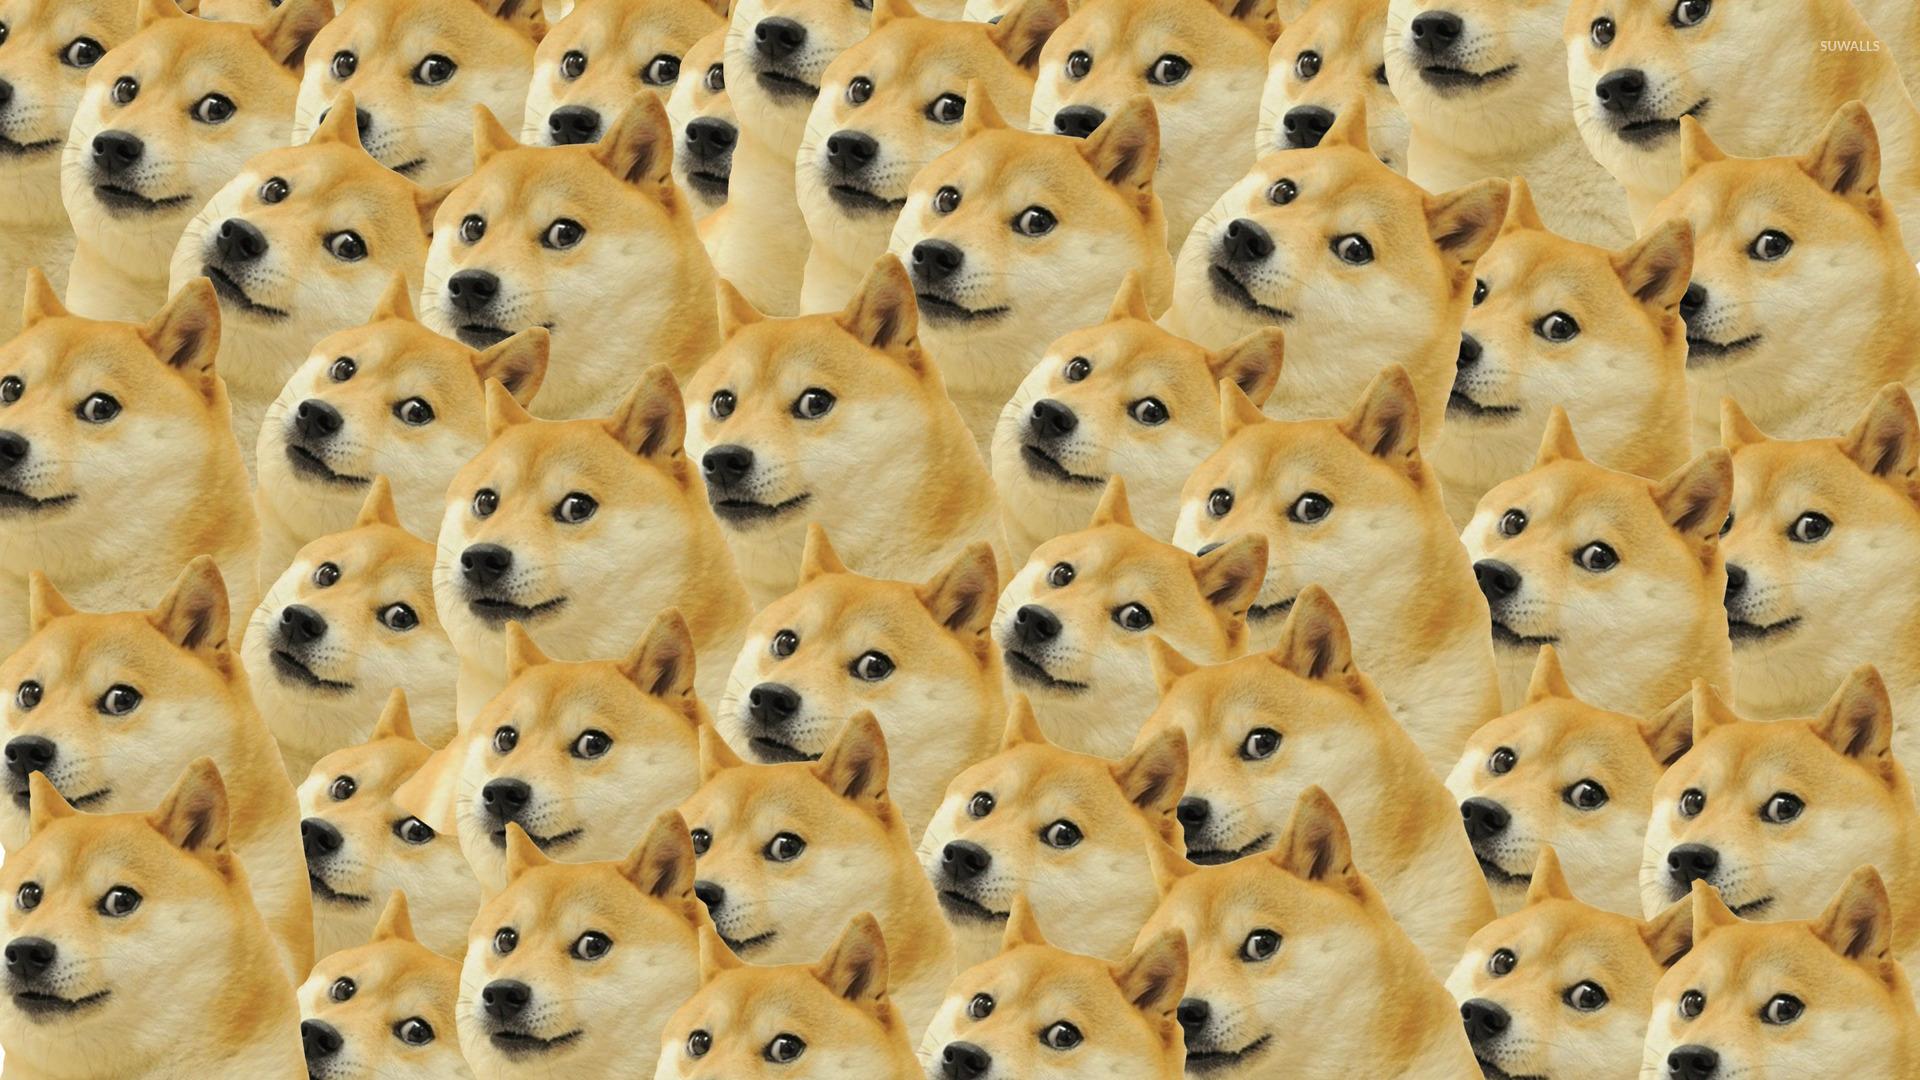 Doge pattern wallpaper   Meme wallpapers   27481 1920x1080